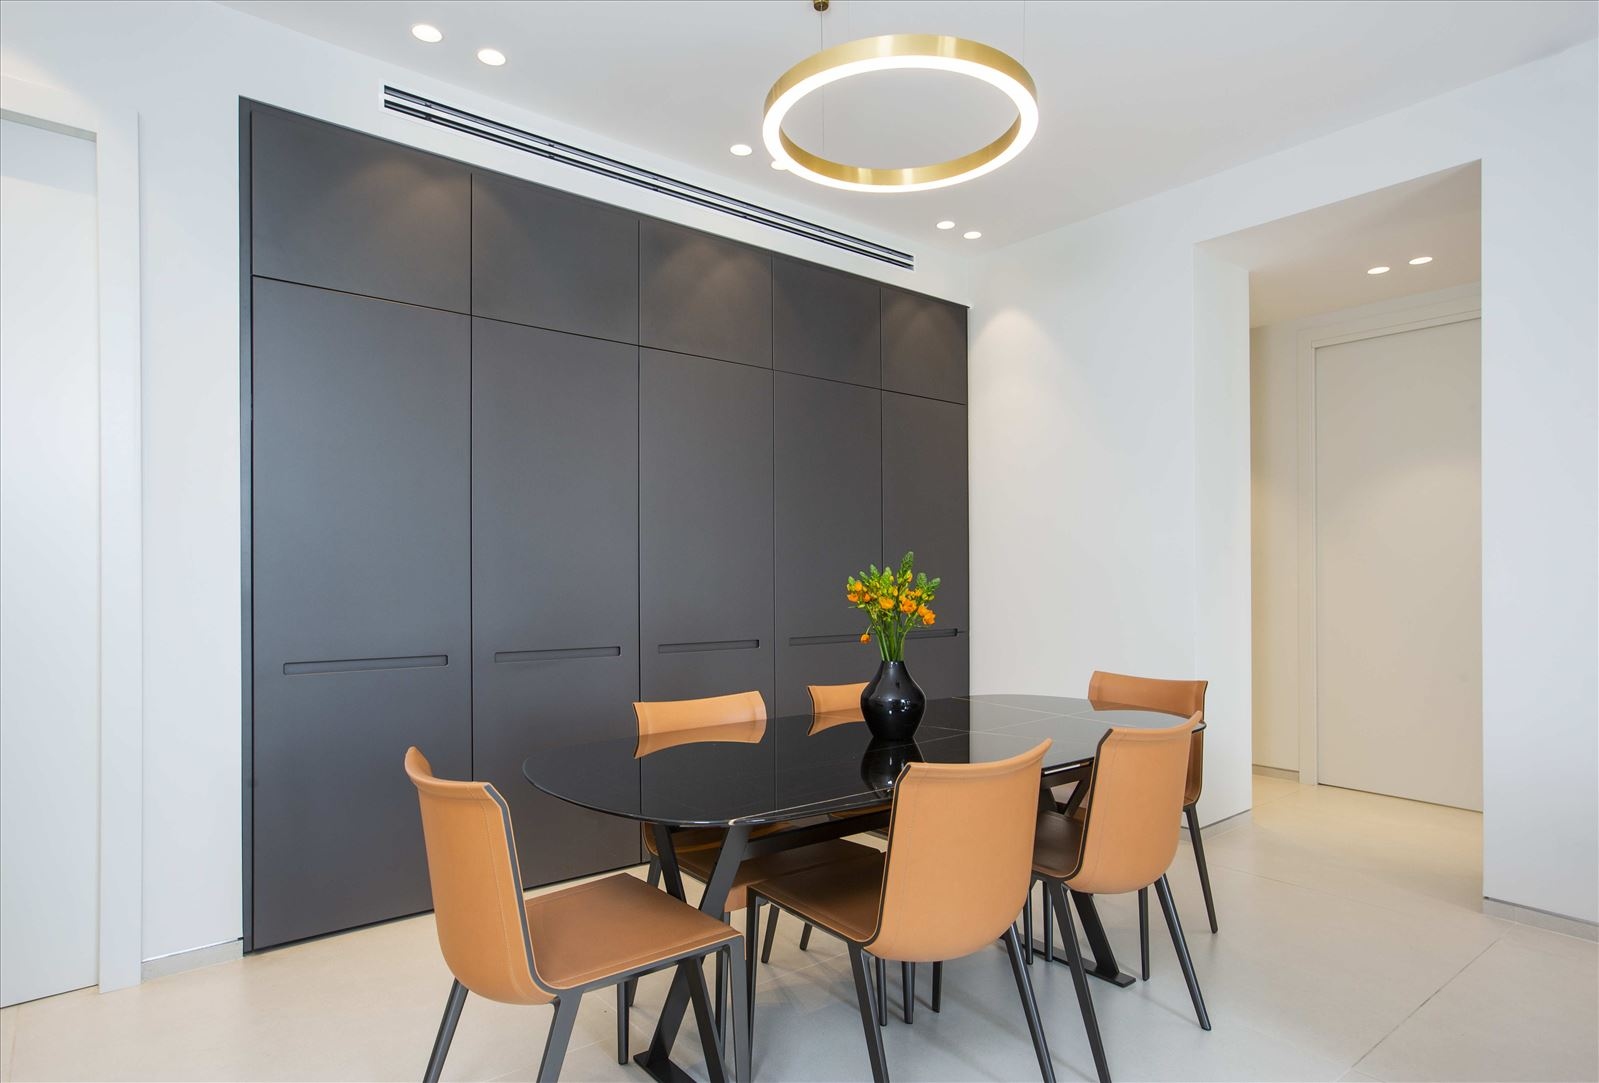 Tel Aviv apartment in Parisian aroma תאורת תקרה מבית דורי קמחי